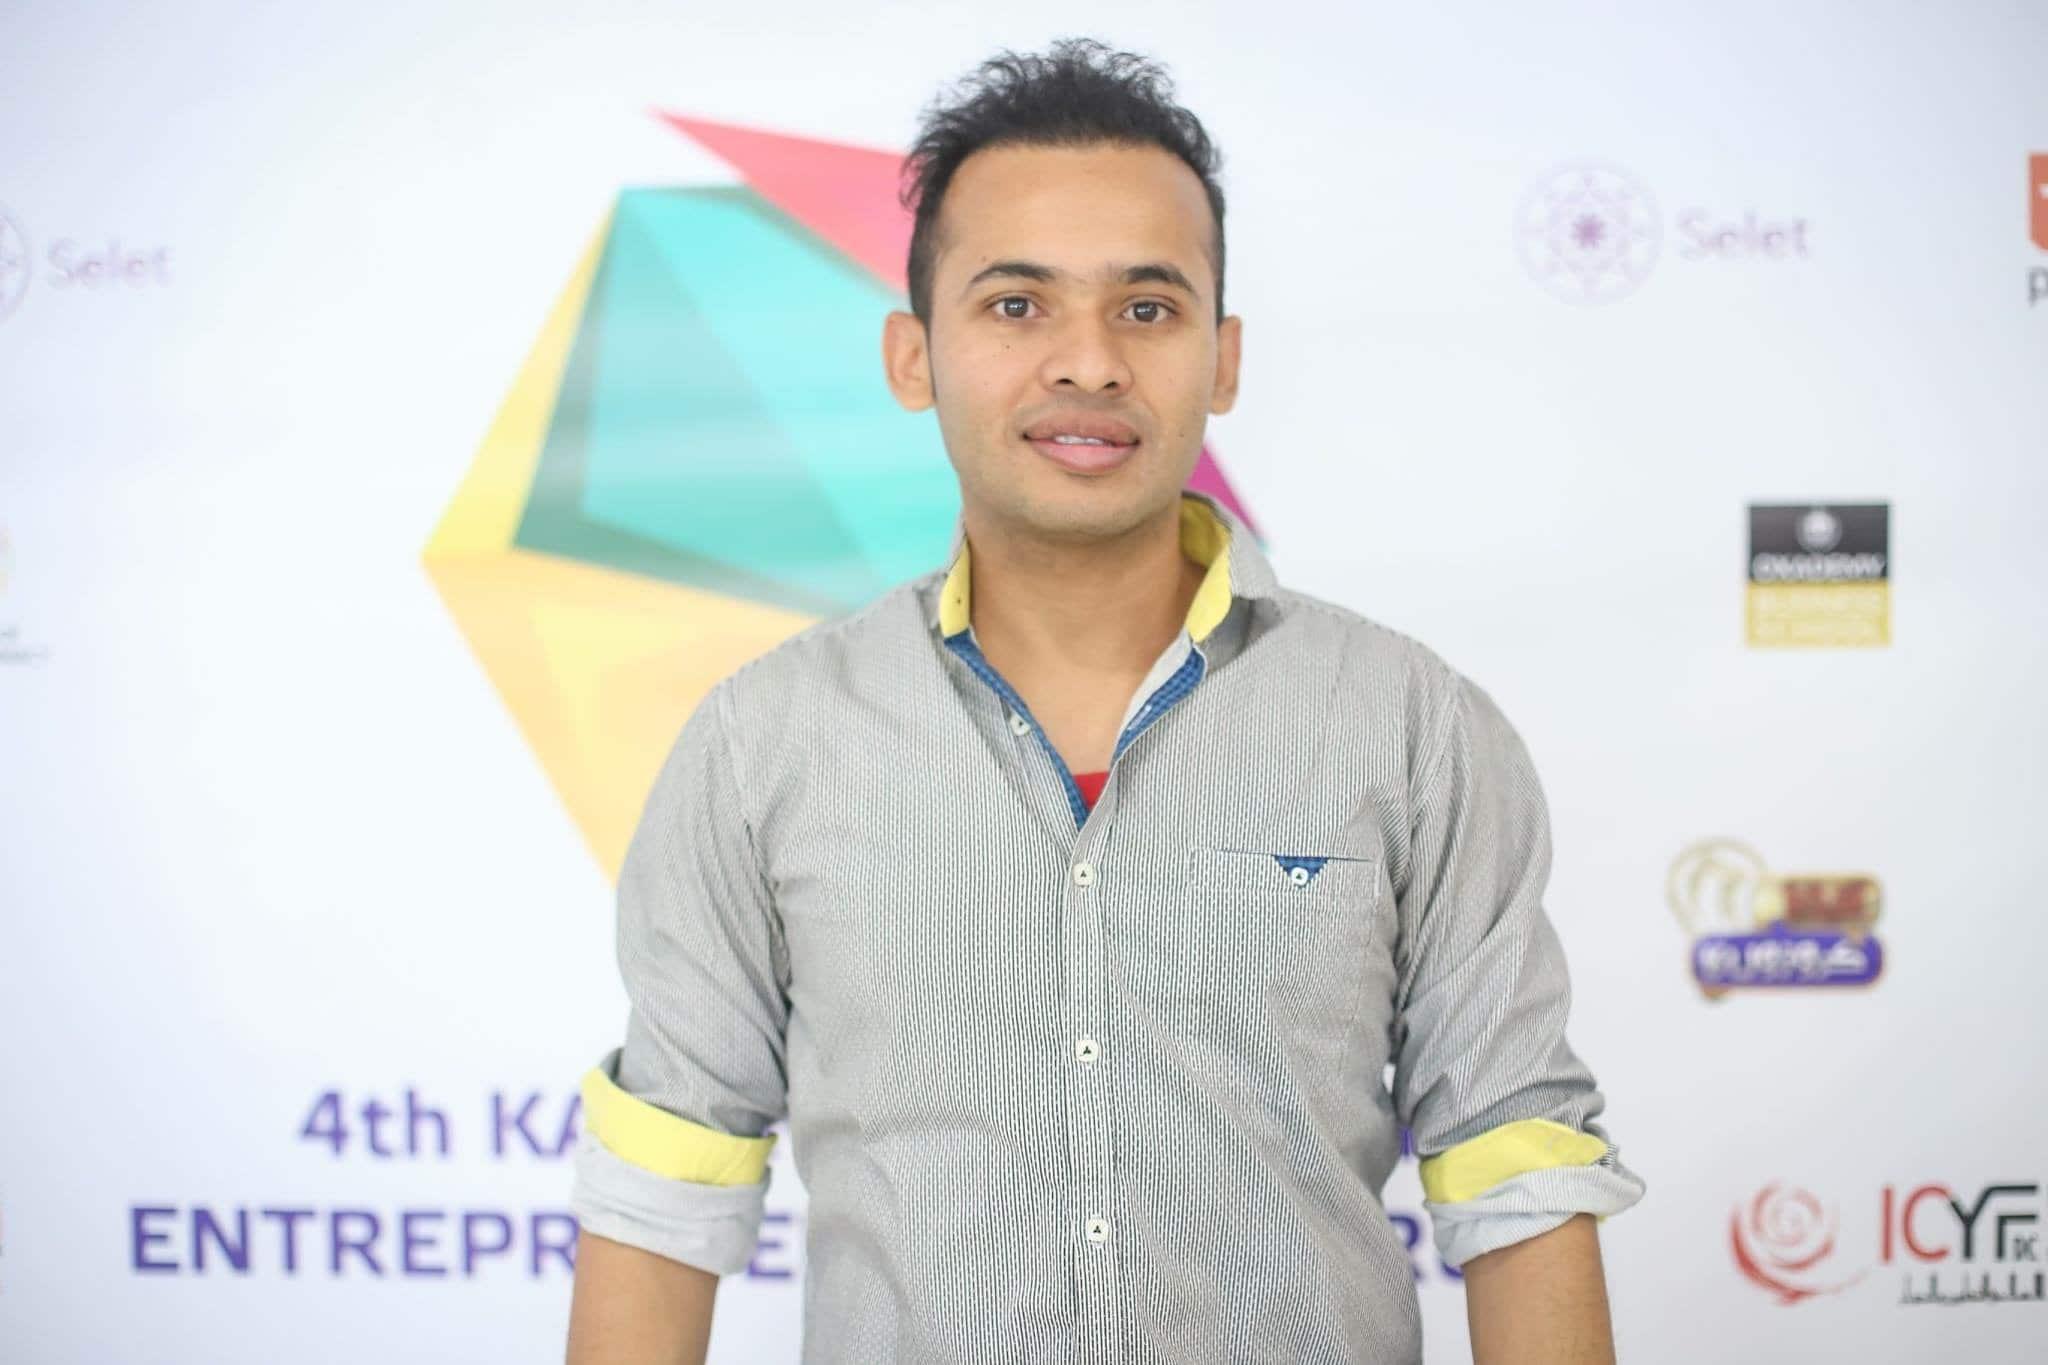 Syed Shuttari LetsLunch.com